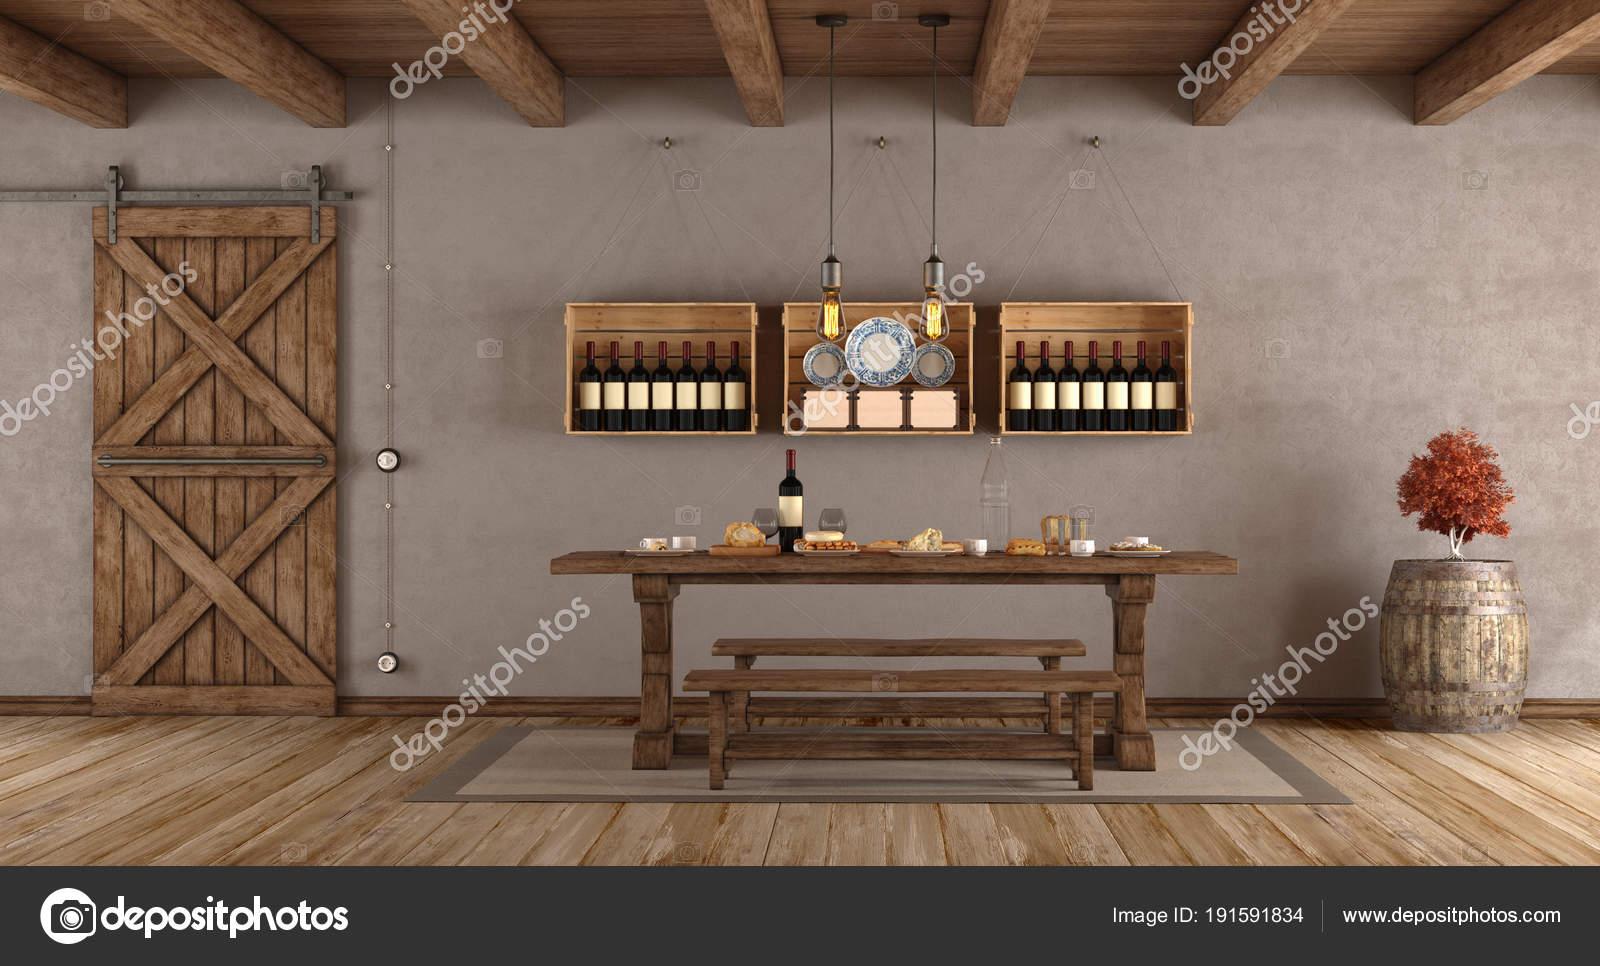 Eetkamer in landelijke stijl — Stockfoto © archideaphoto #191591834